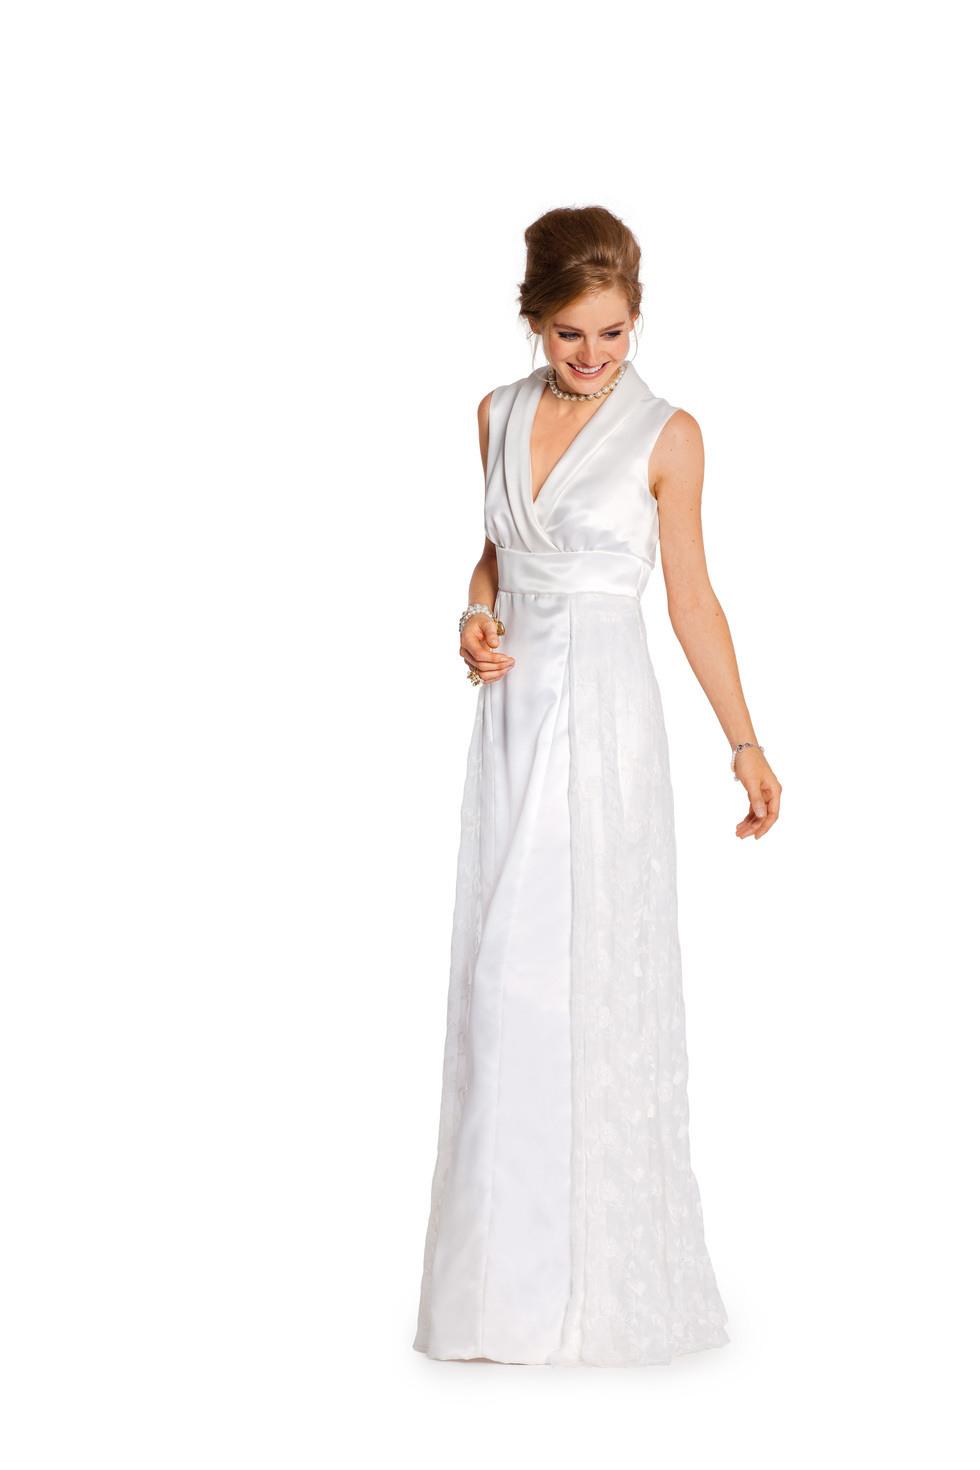 10 Spektakulär Abendkleider Schnittmuster Bester PreisDesigner Luxurius Abendkleider Schnittmuster Vertrieb